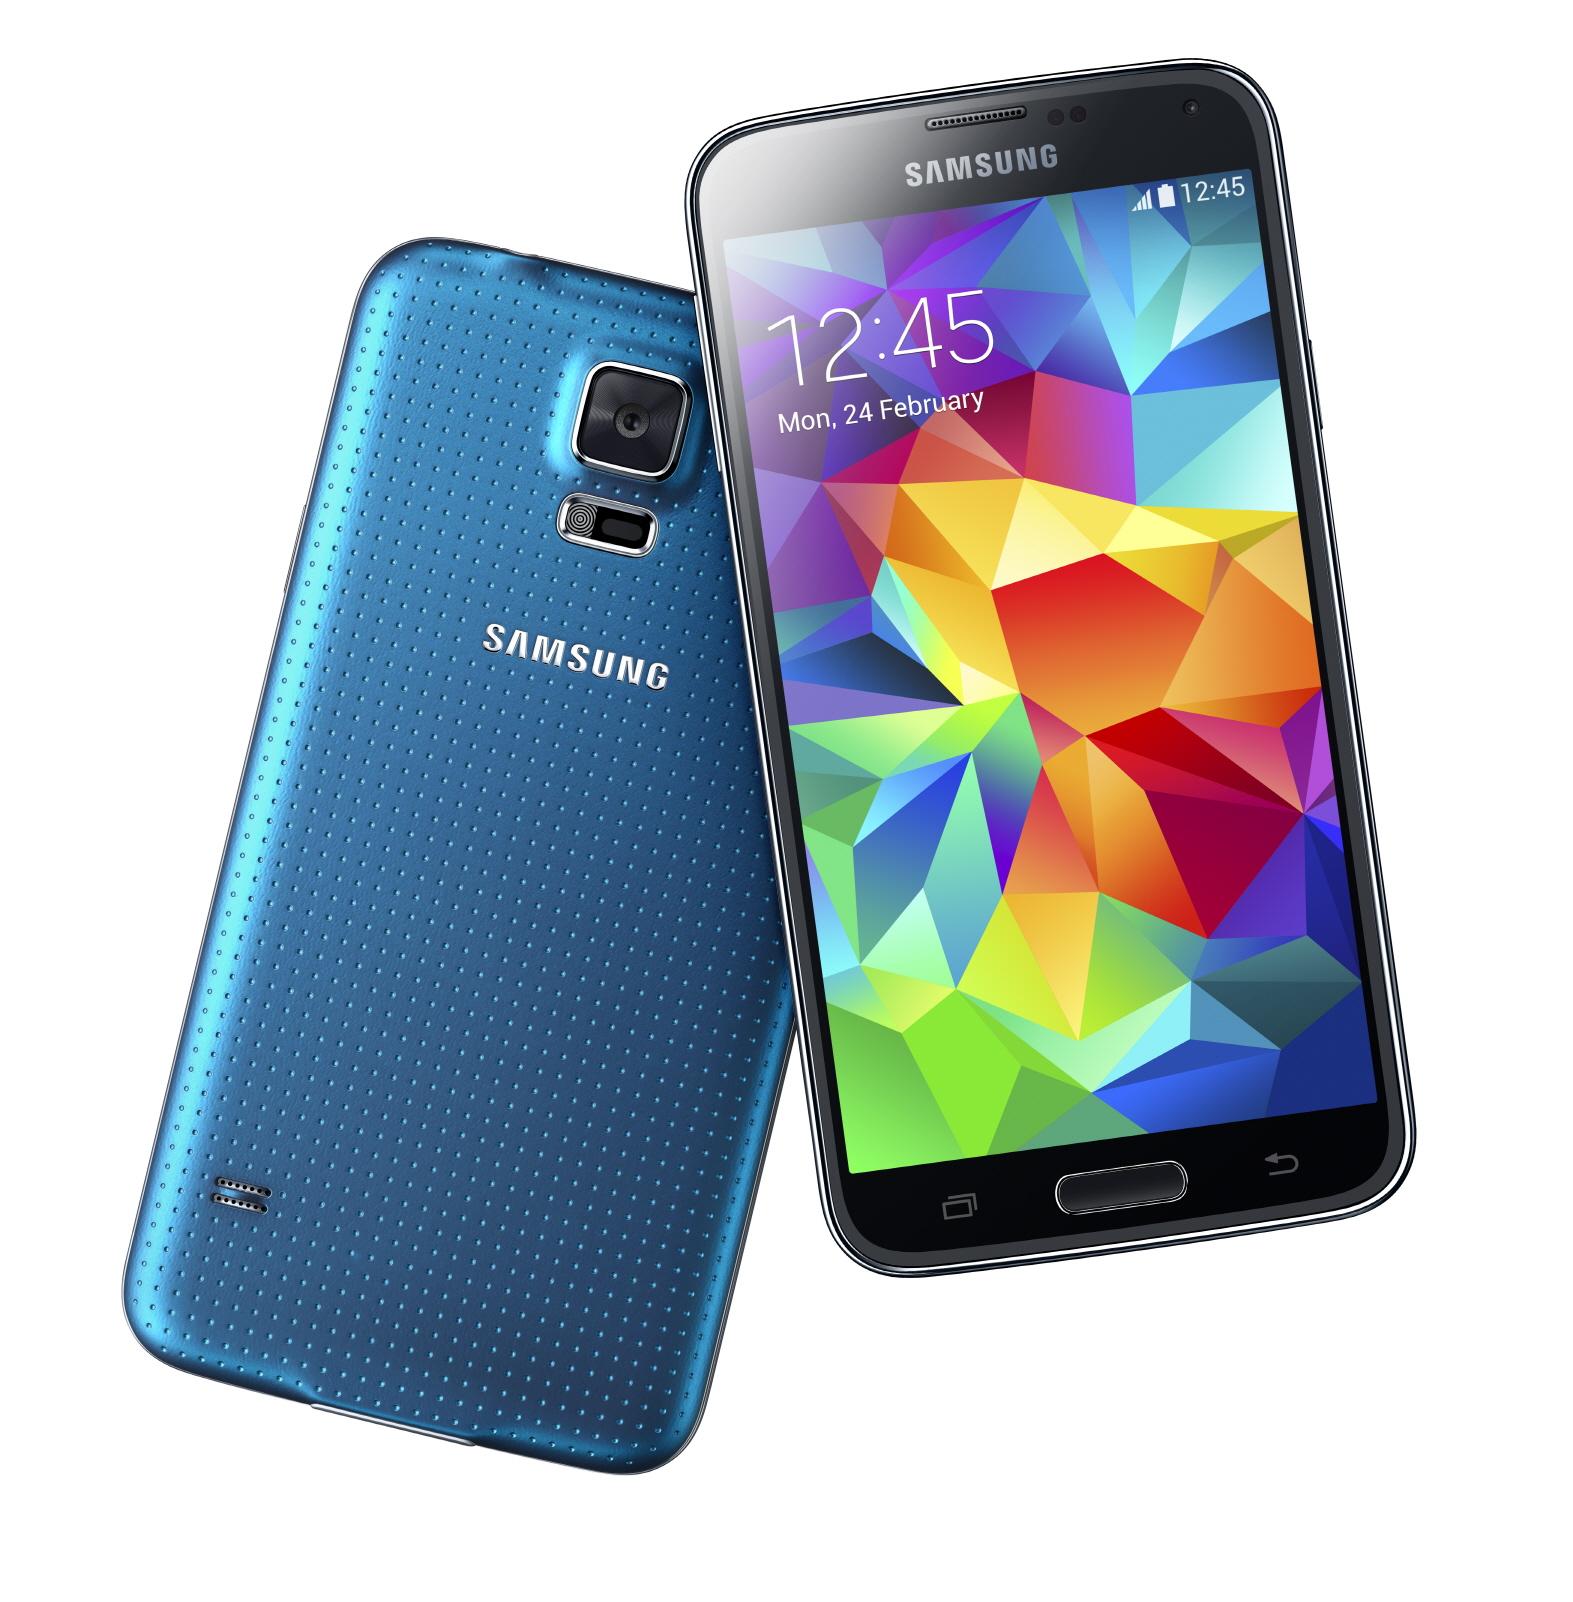 How to unlock Samsung Galaxy S5